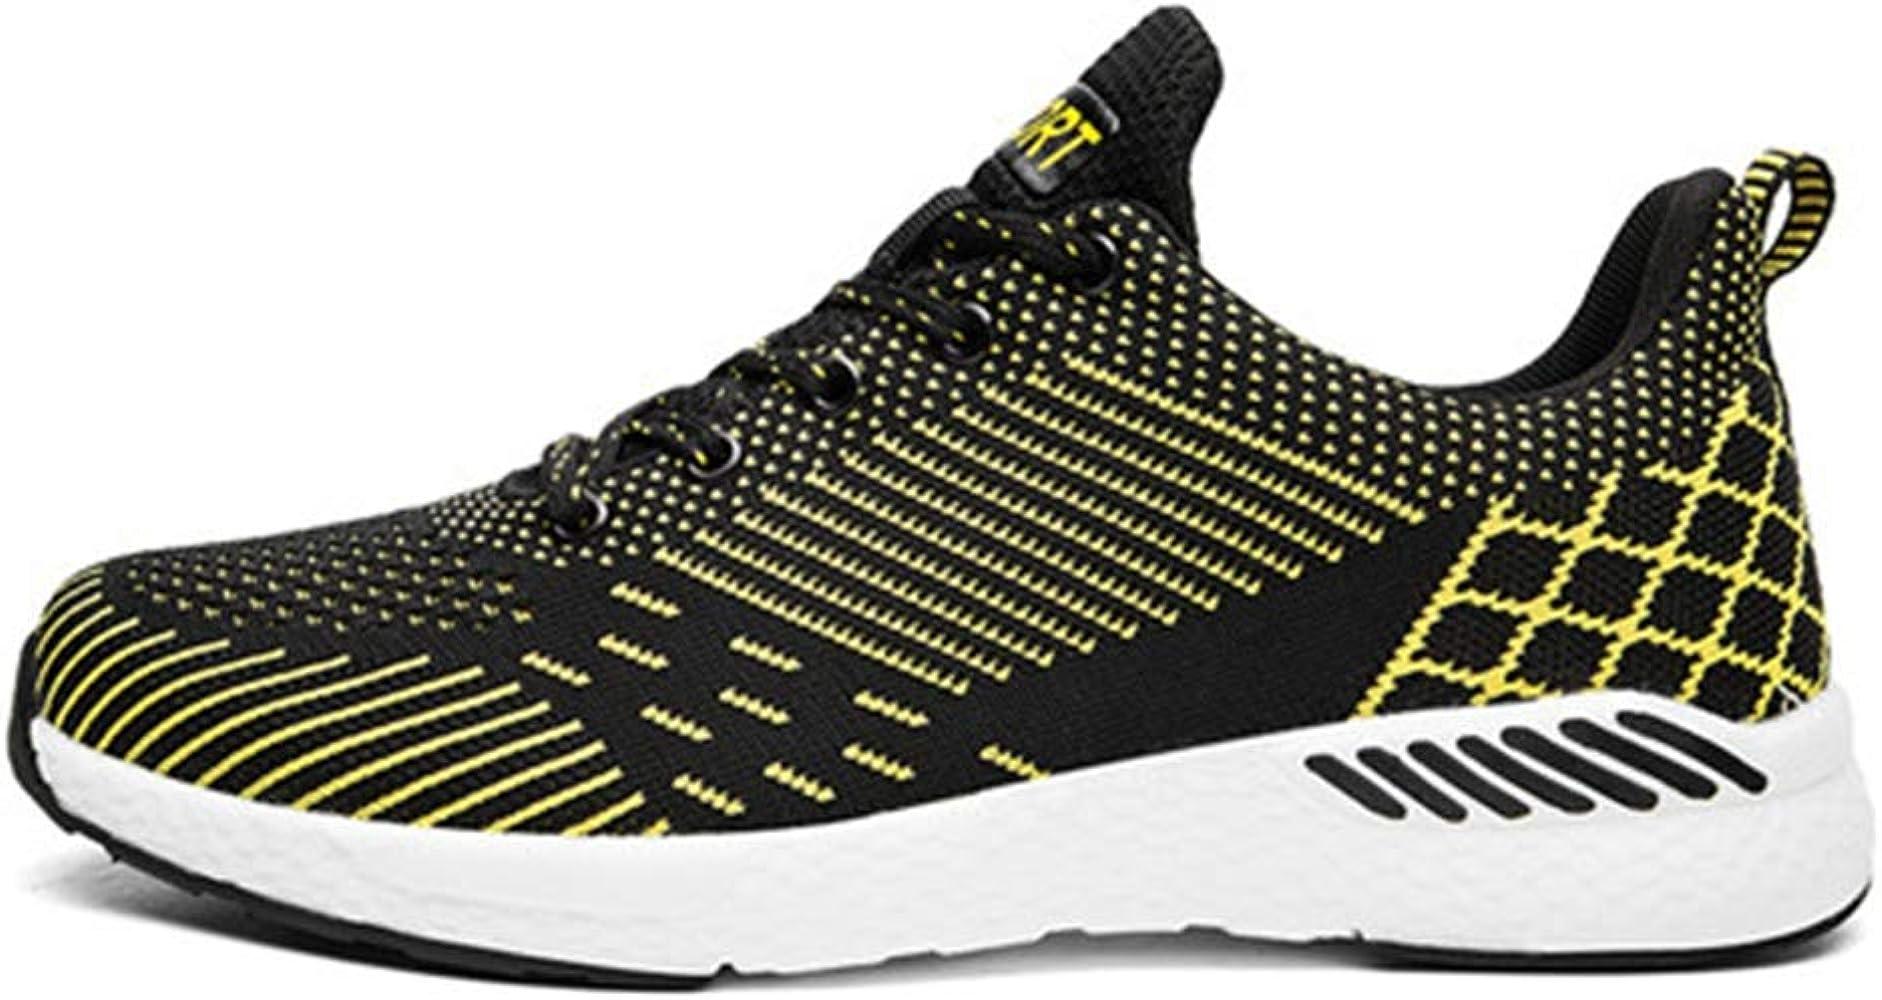 Calzado para Correr Use Zapatillas Antideslizantes Resistentes ...